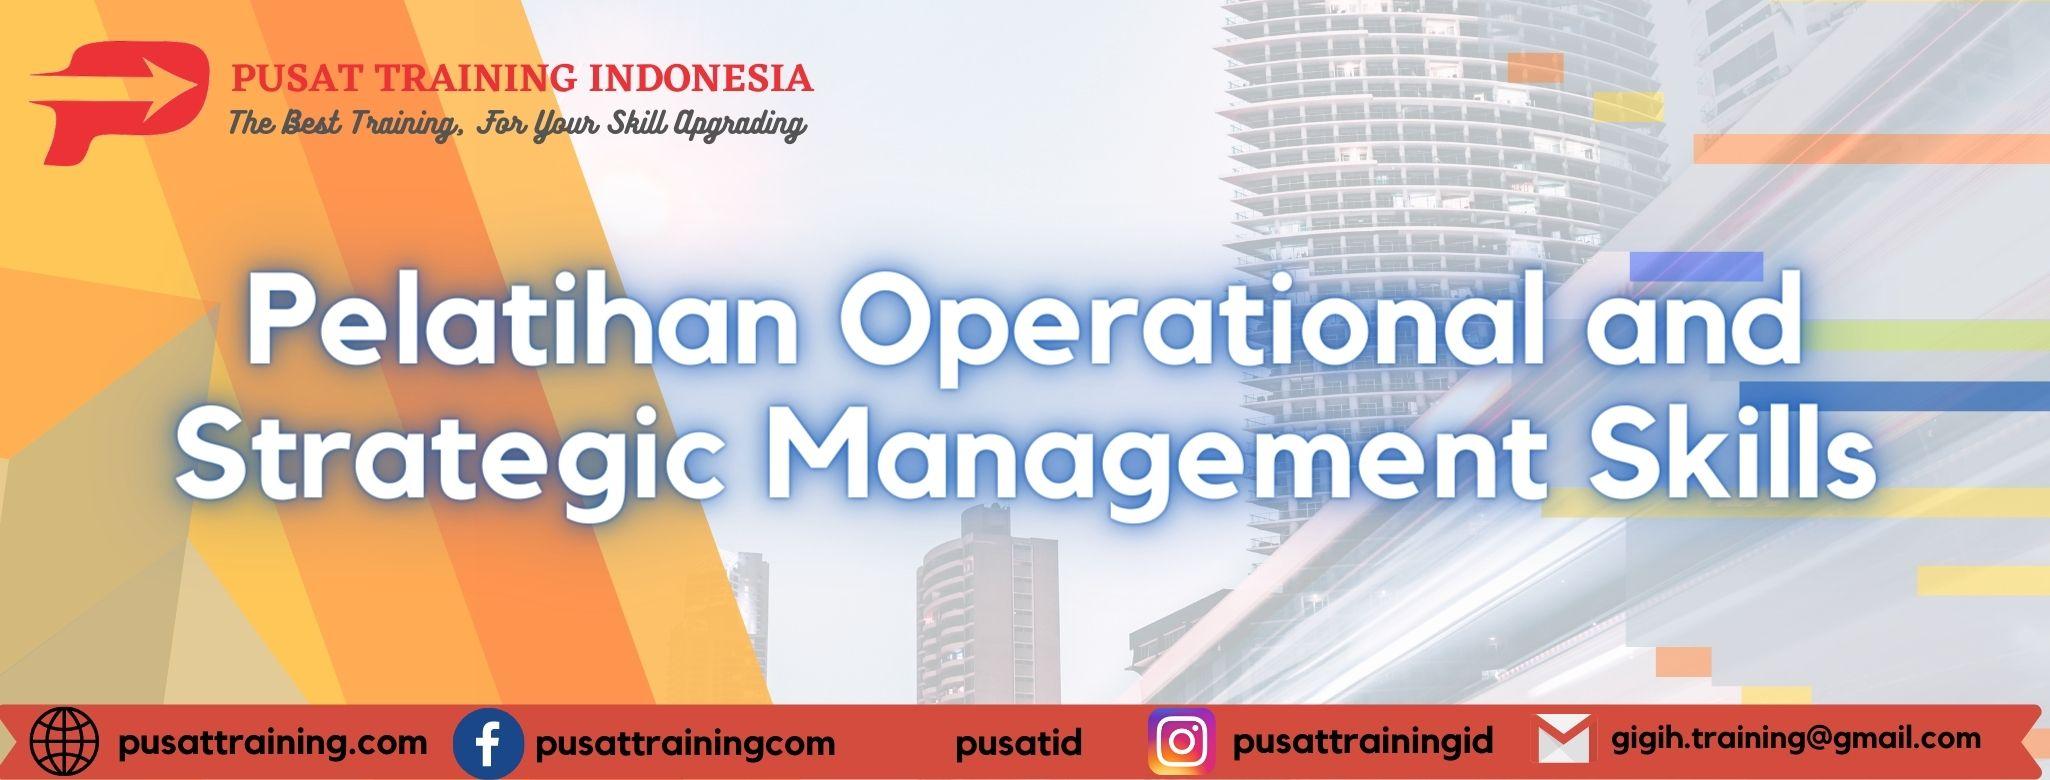 Pelatihan-Operational-and-Strategic-Management-Skills